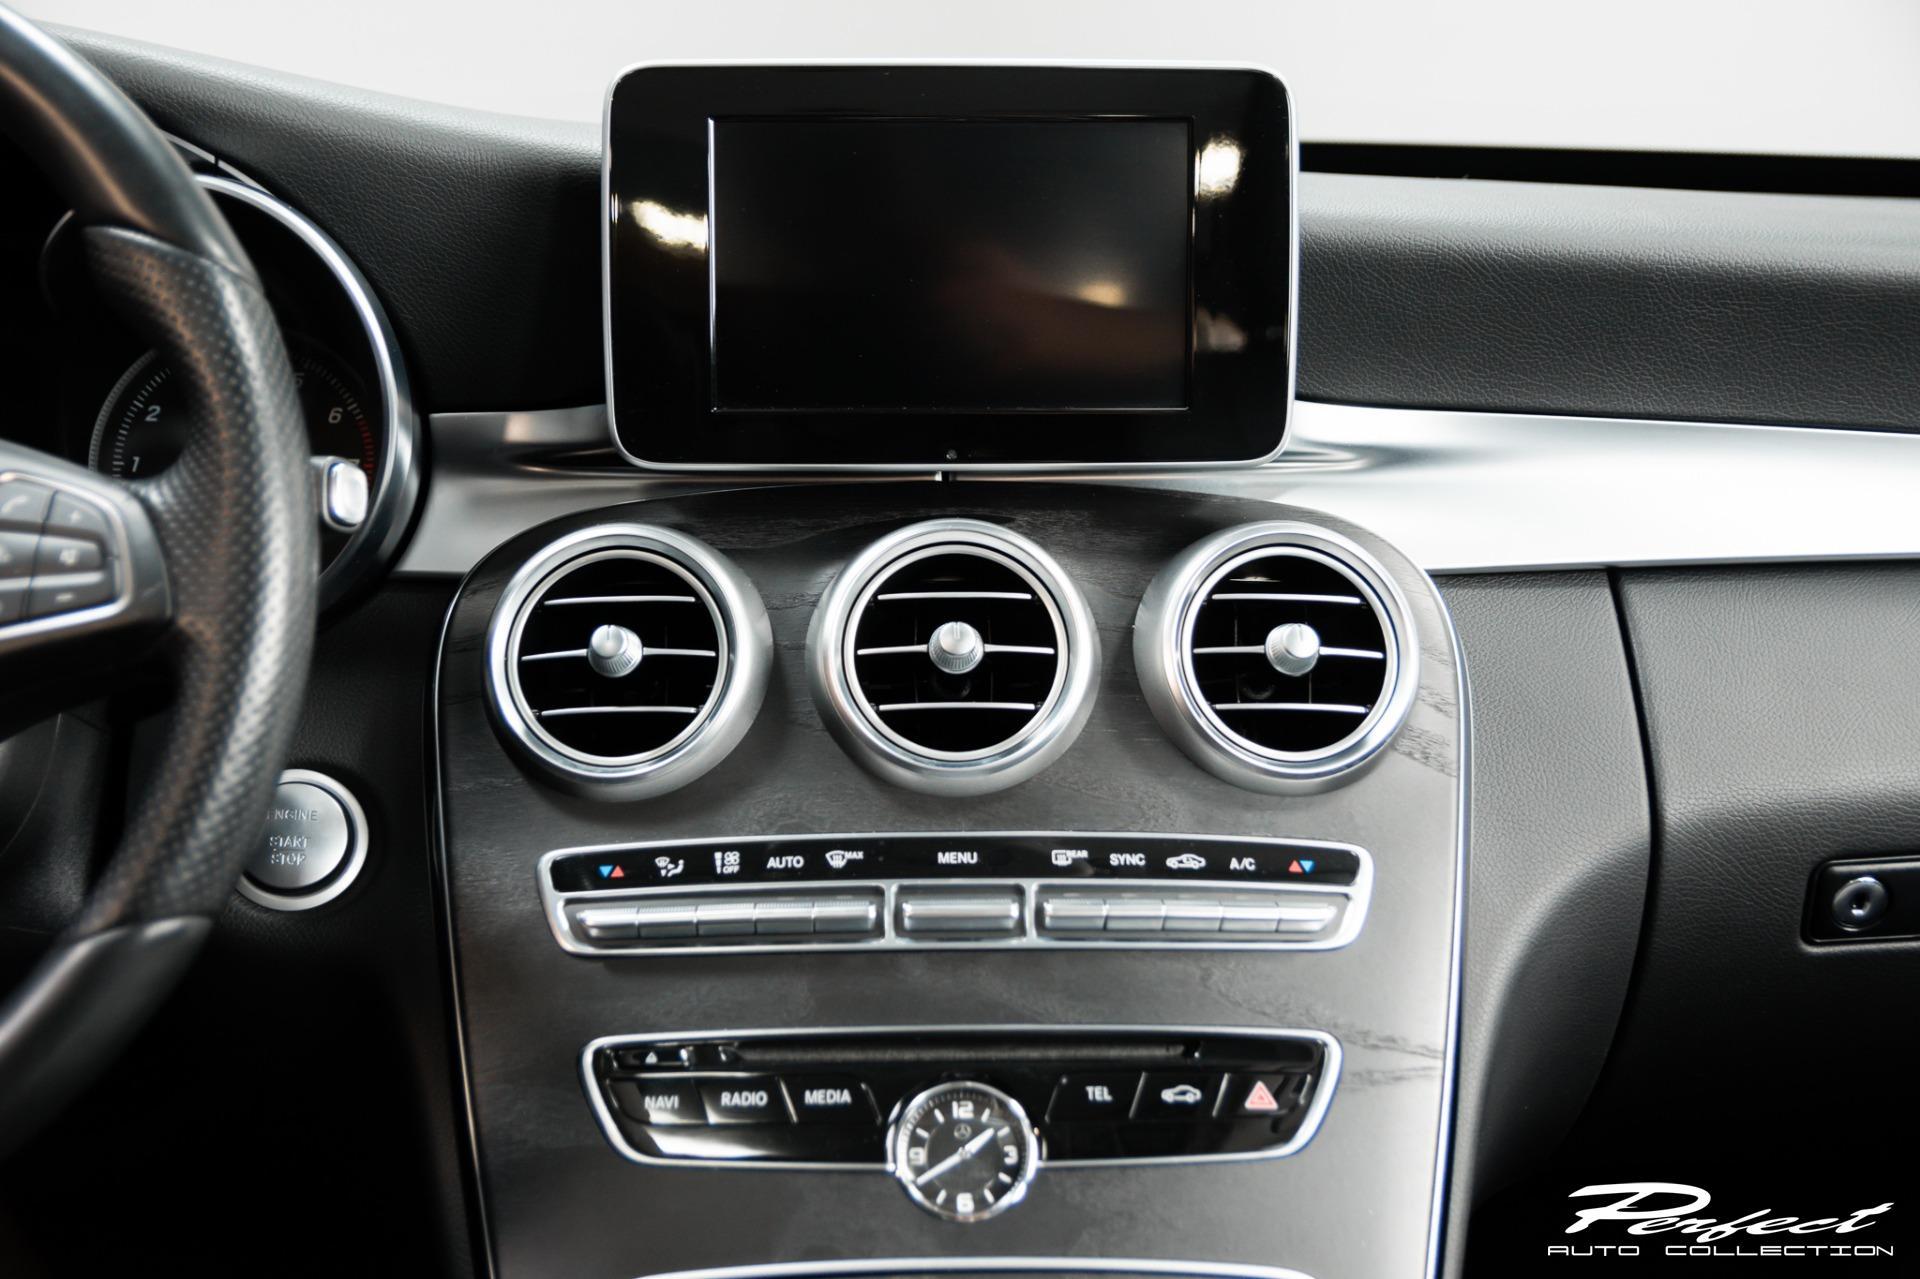 Used 2017 Mercedes Benz C Class C 300 4MATIC